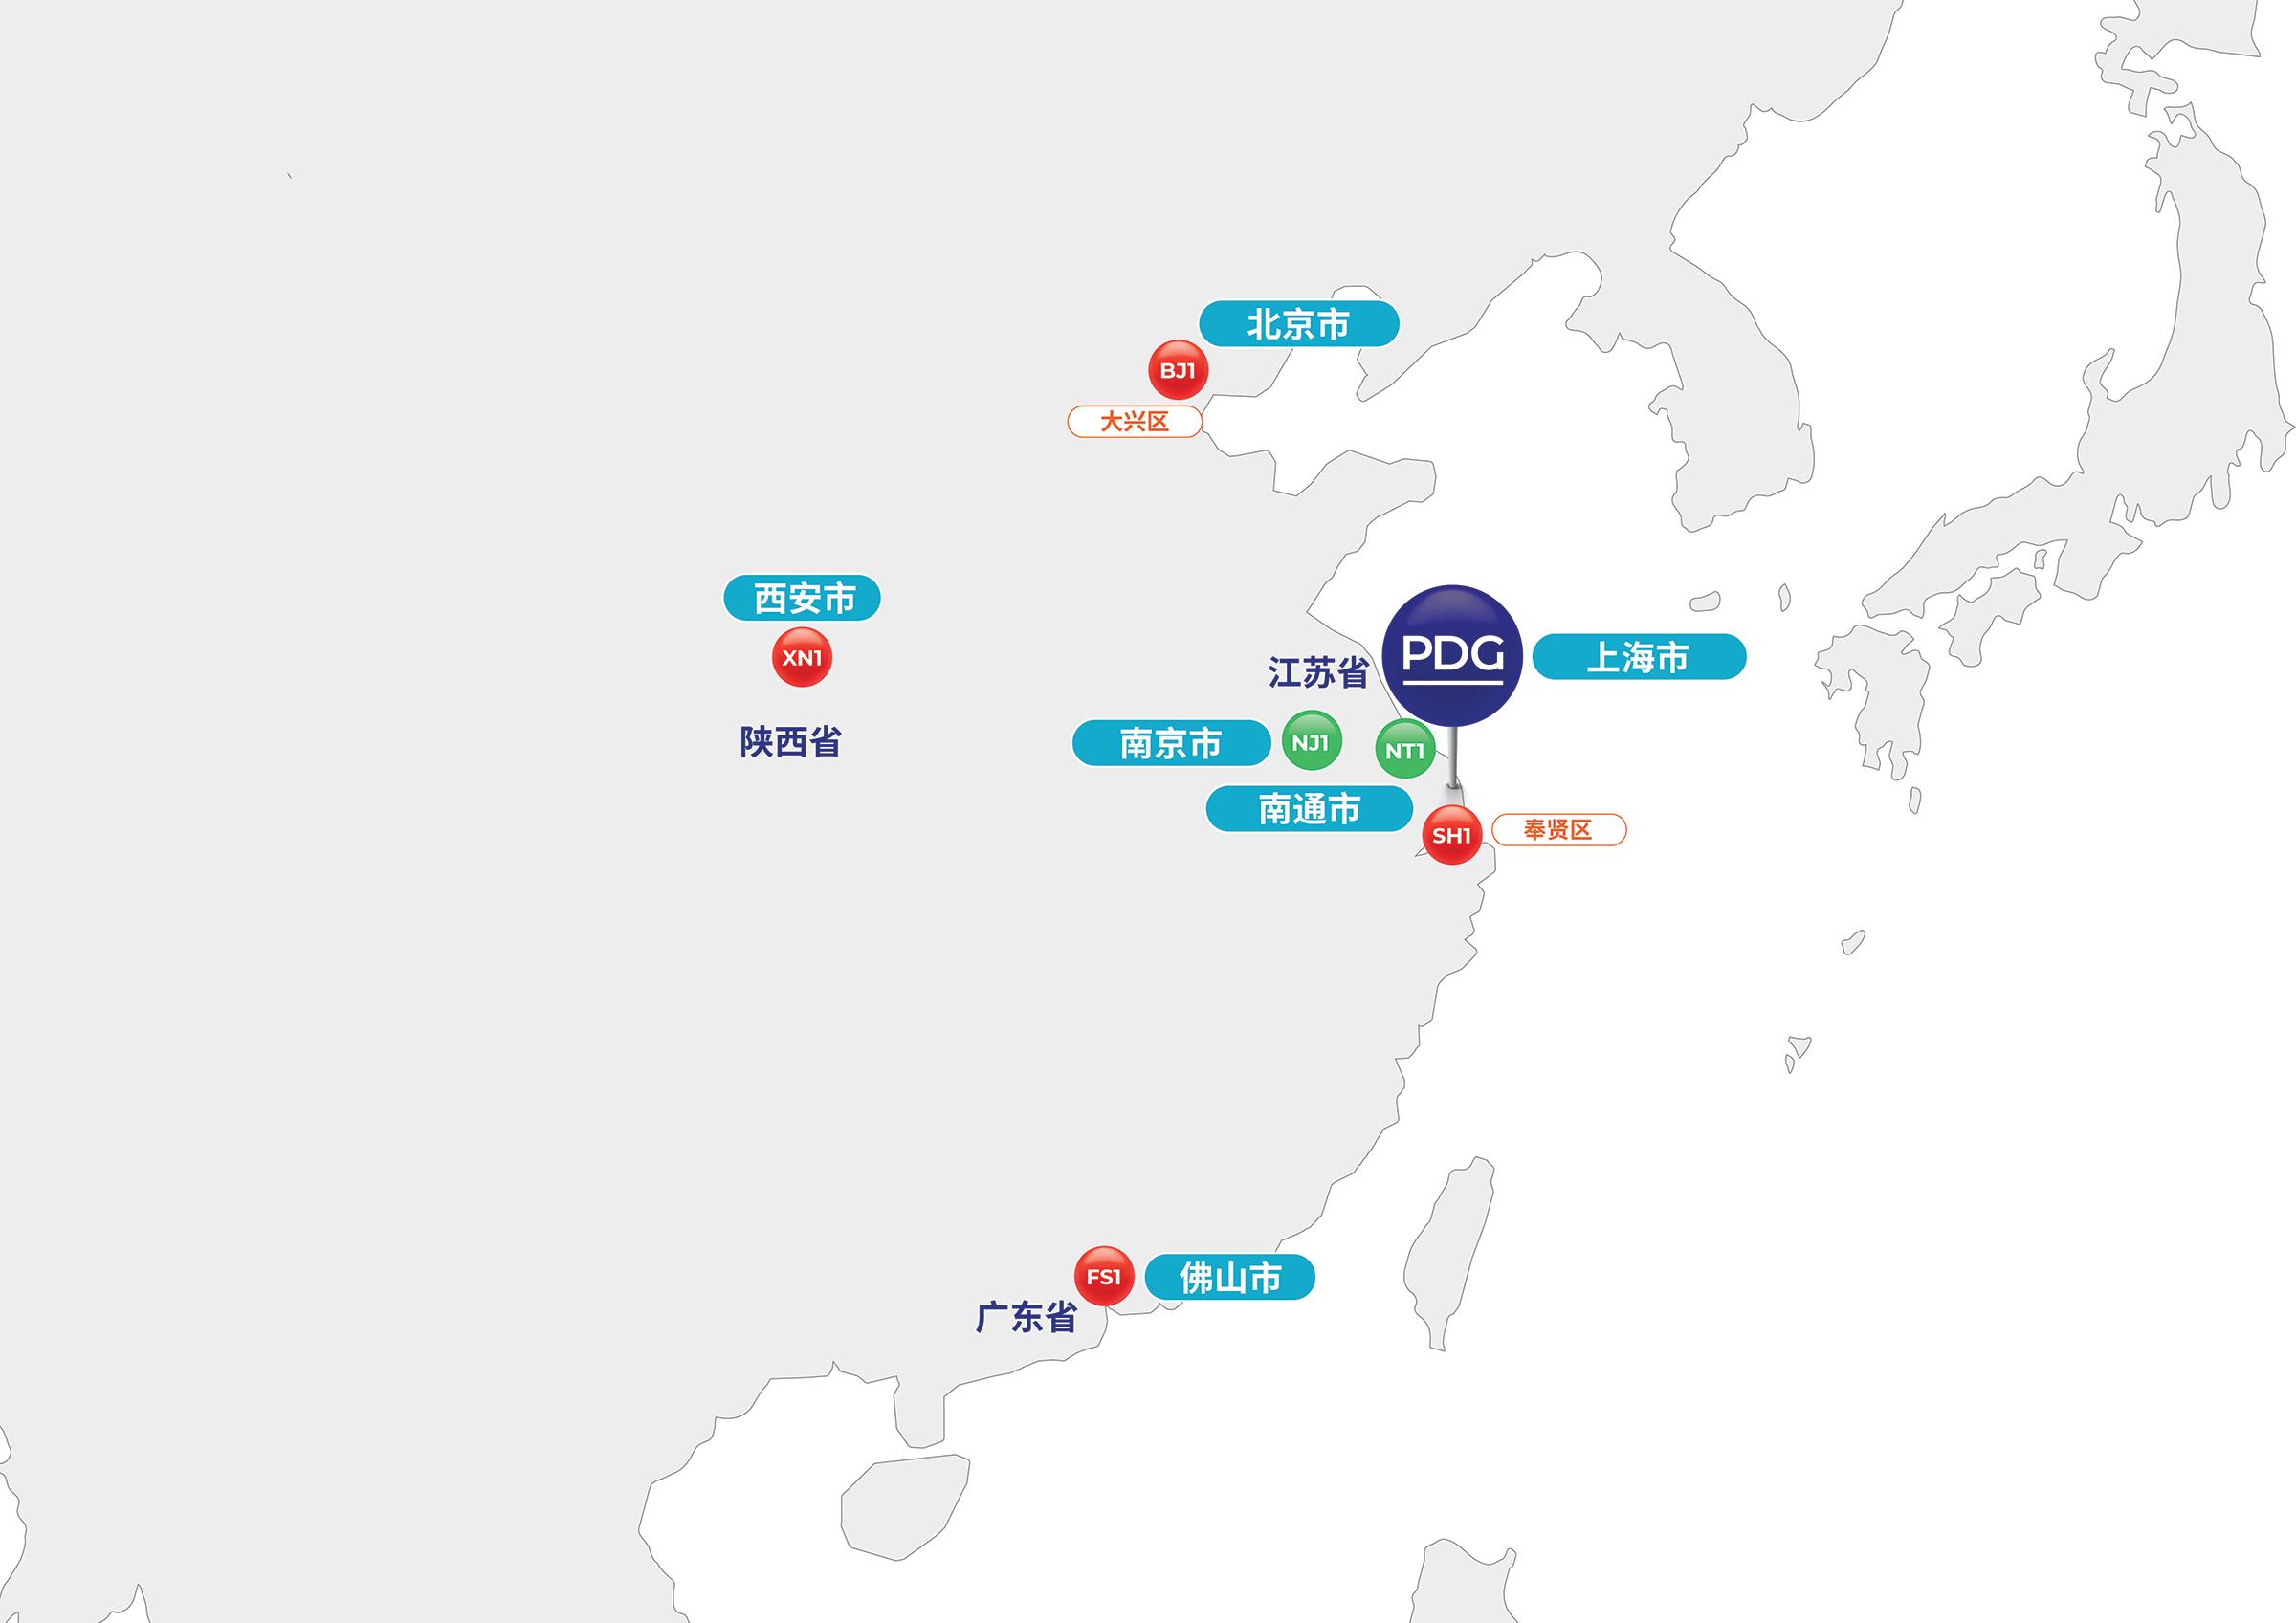 Map of China and PDG Presence